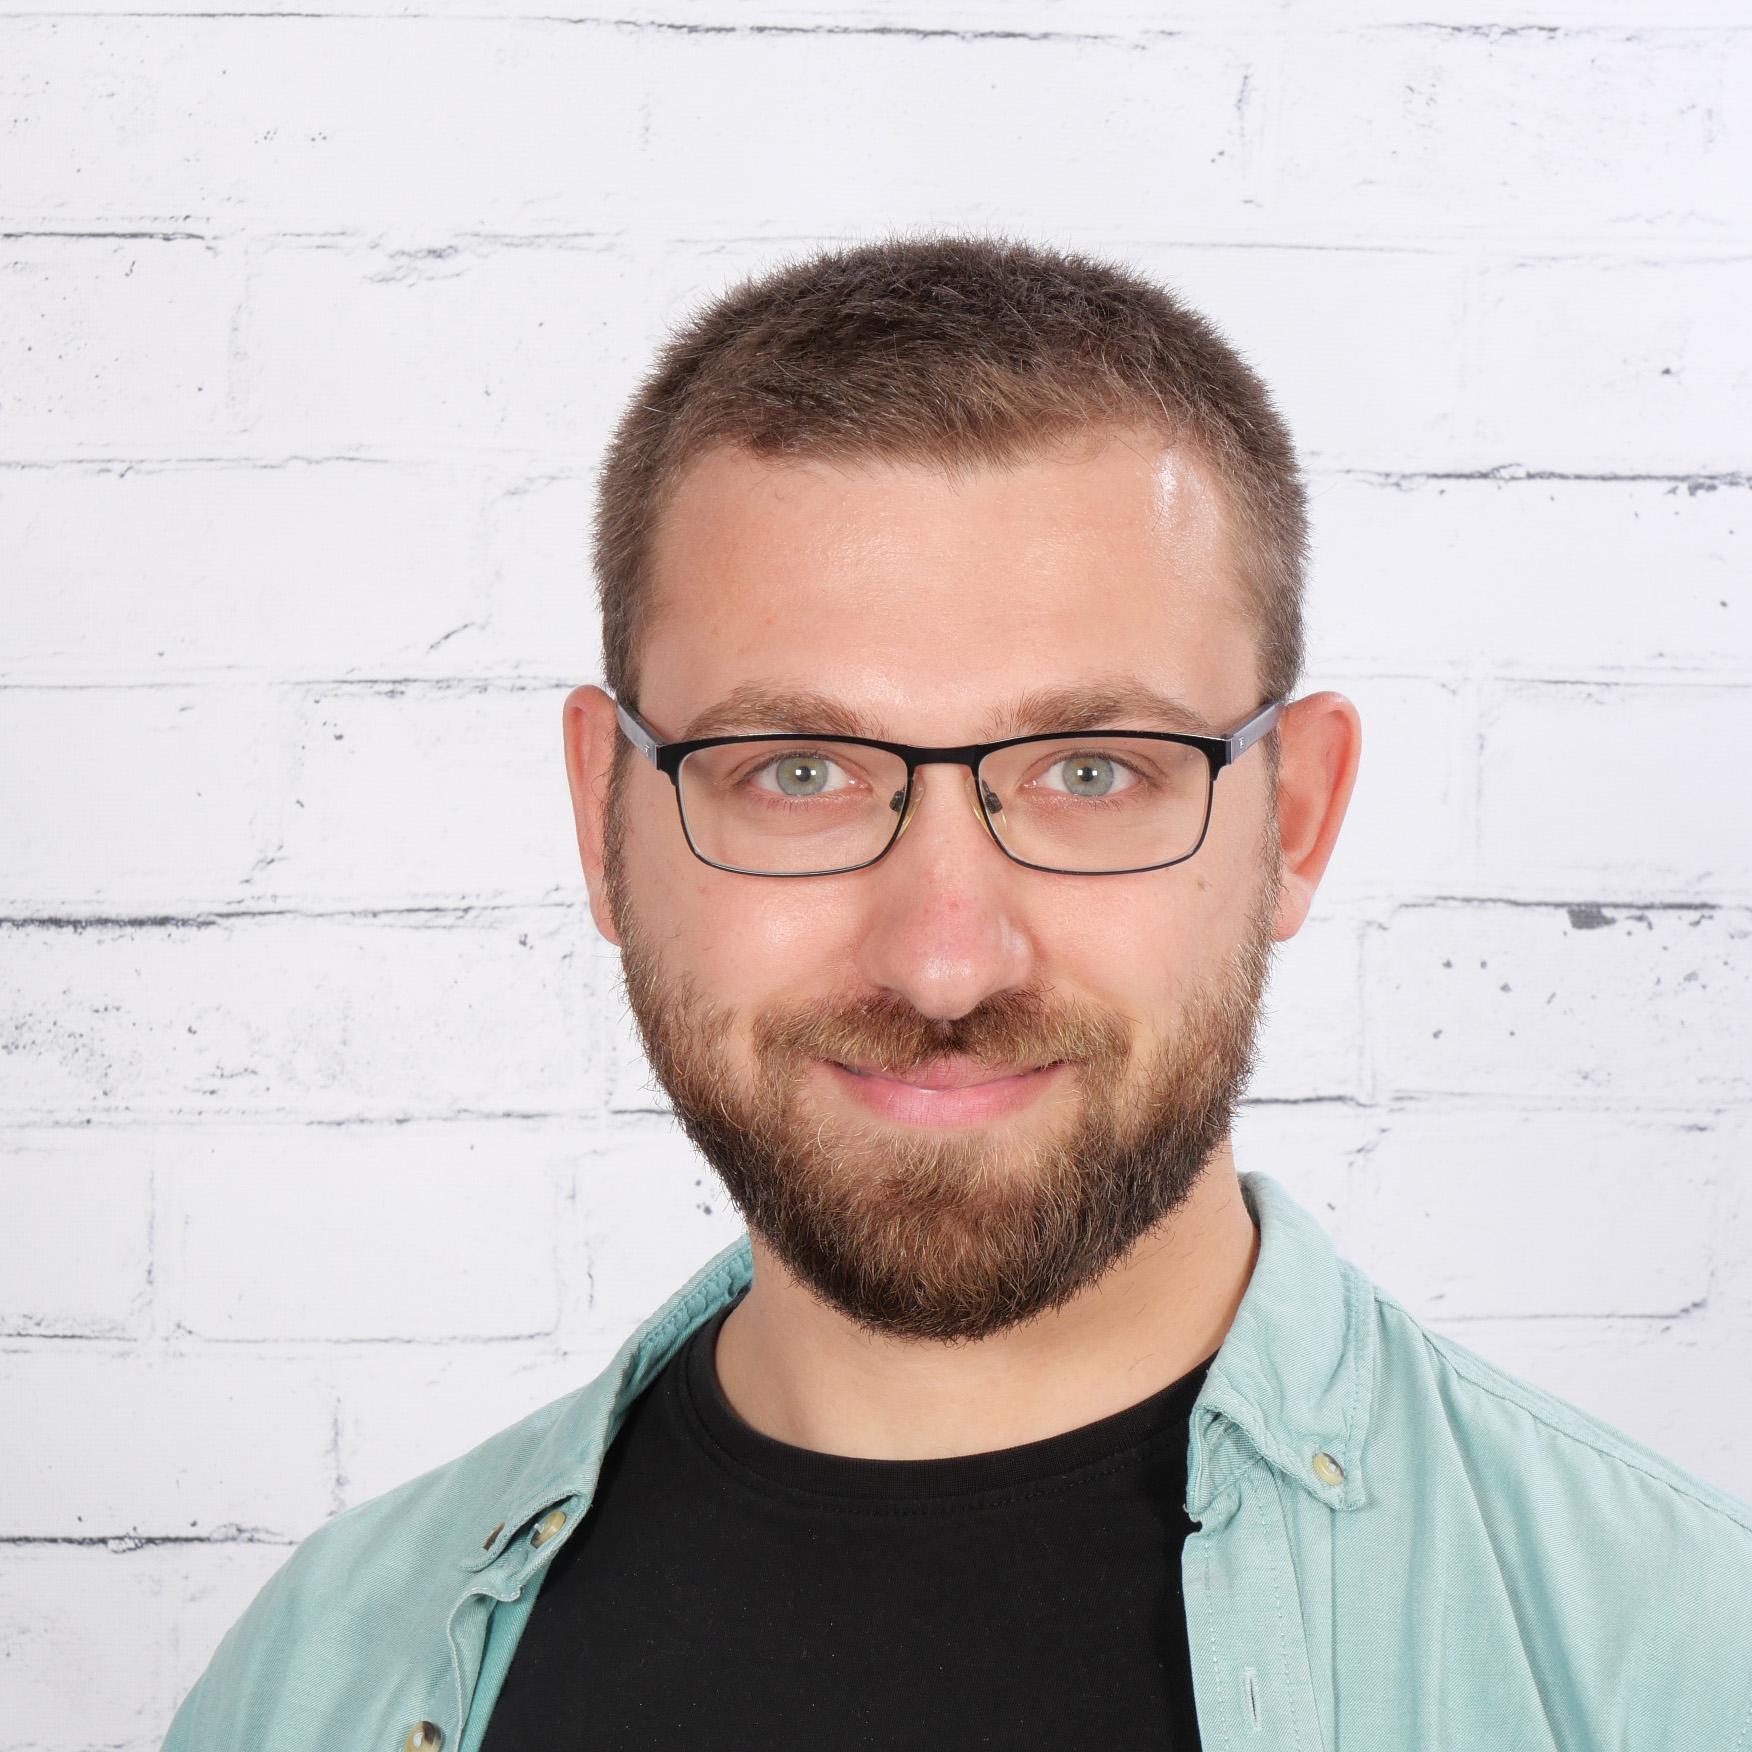 Profilbild von Michael Soub